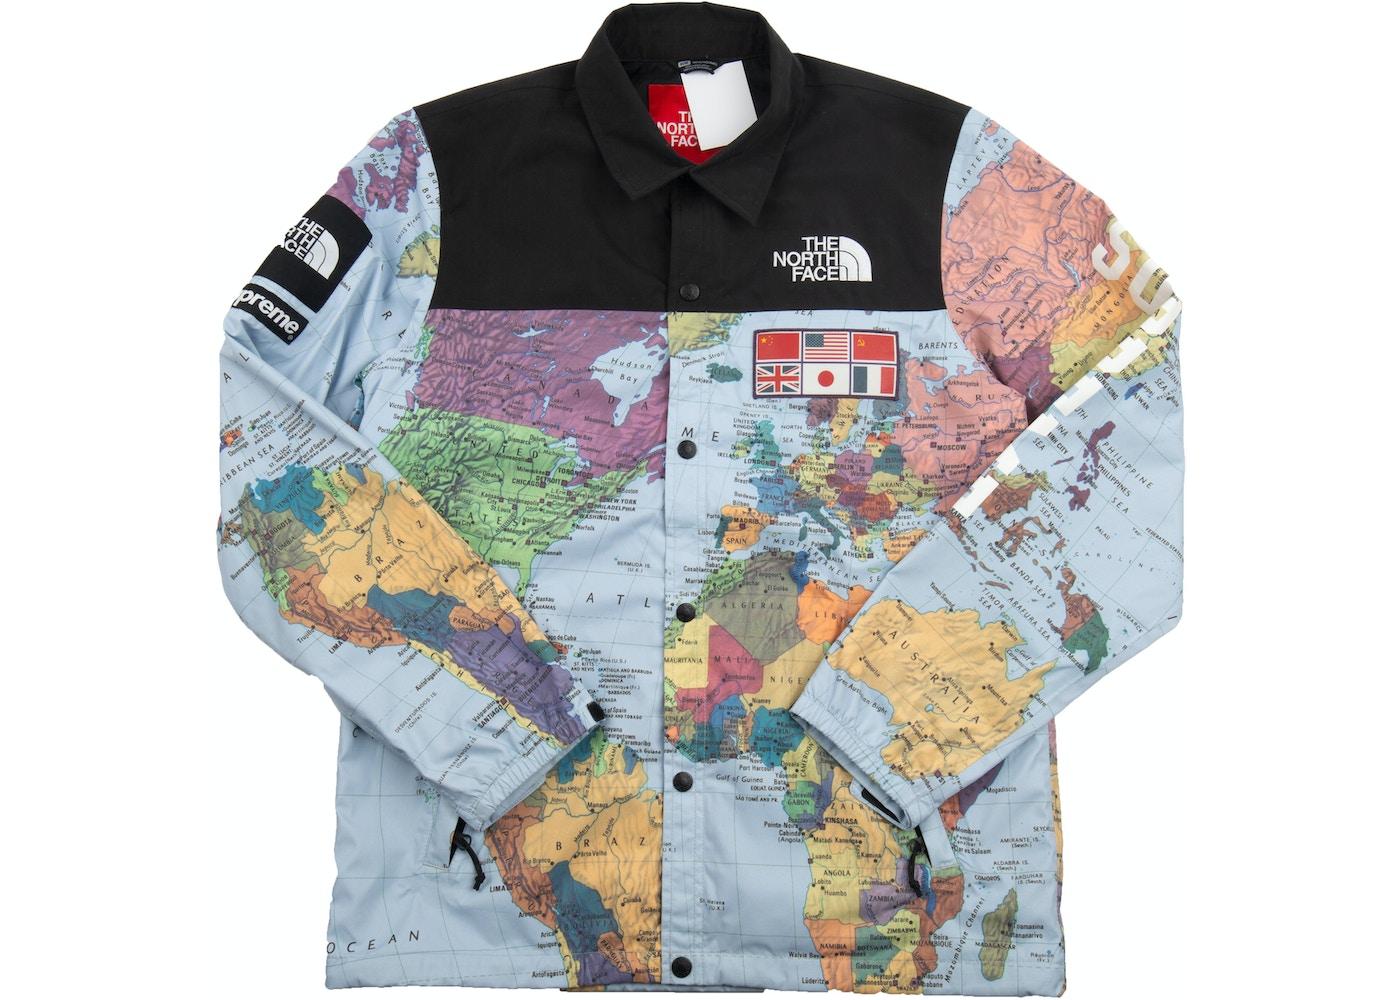 d36aa7c76 Streetwear - Supreme Jackets - Average Sale Price